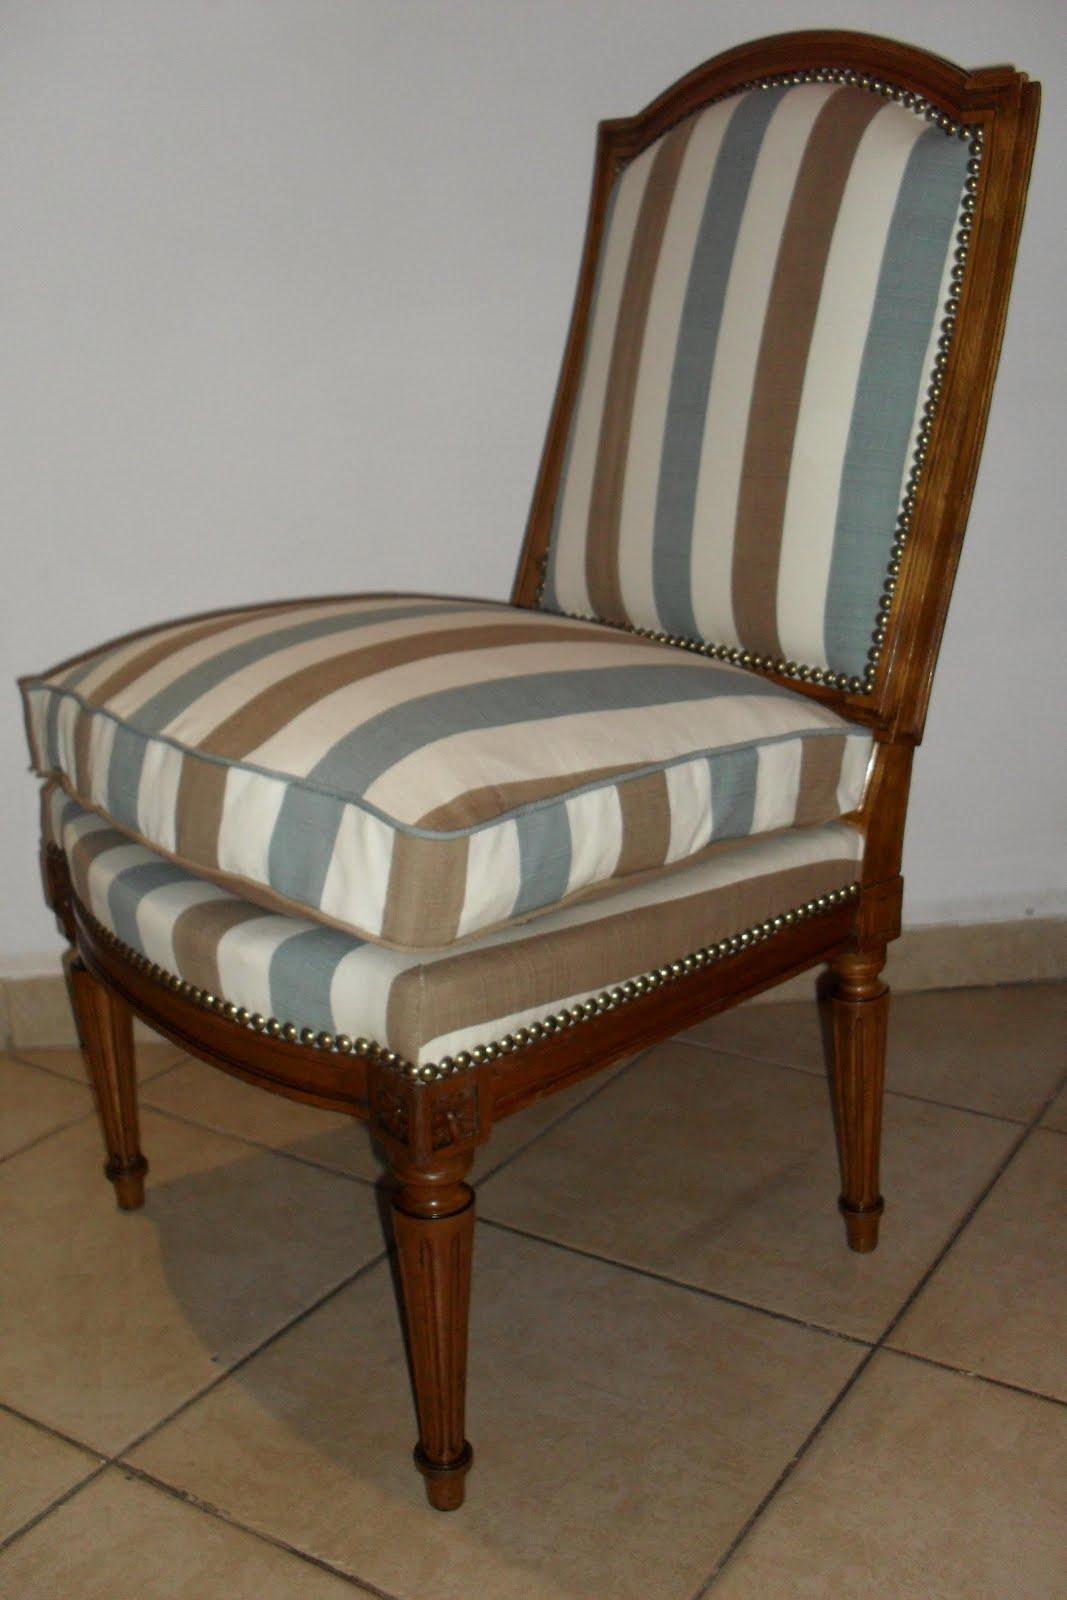 Hugo escobar deco tapiceria antigua y contempor nea - Tapiceria de sillas ...